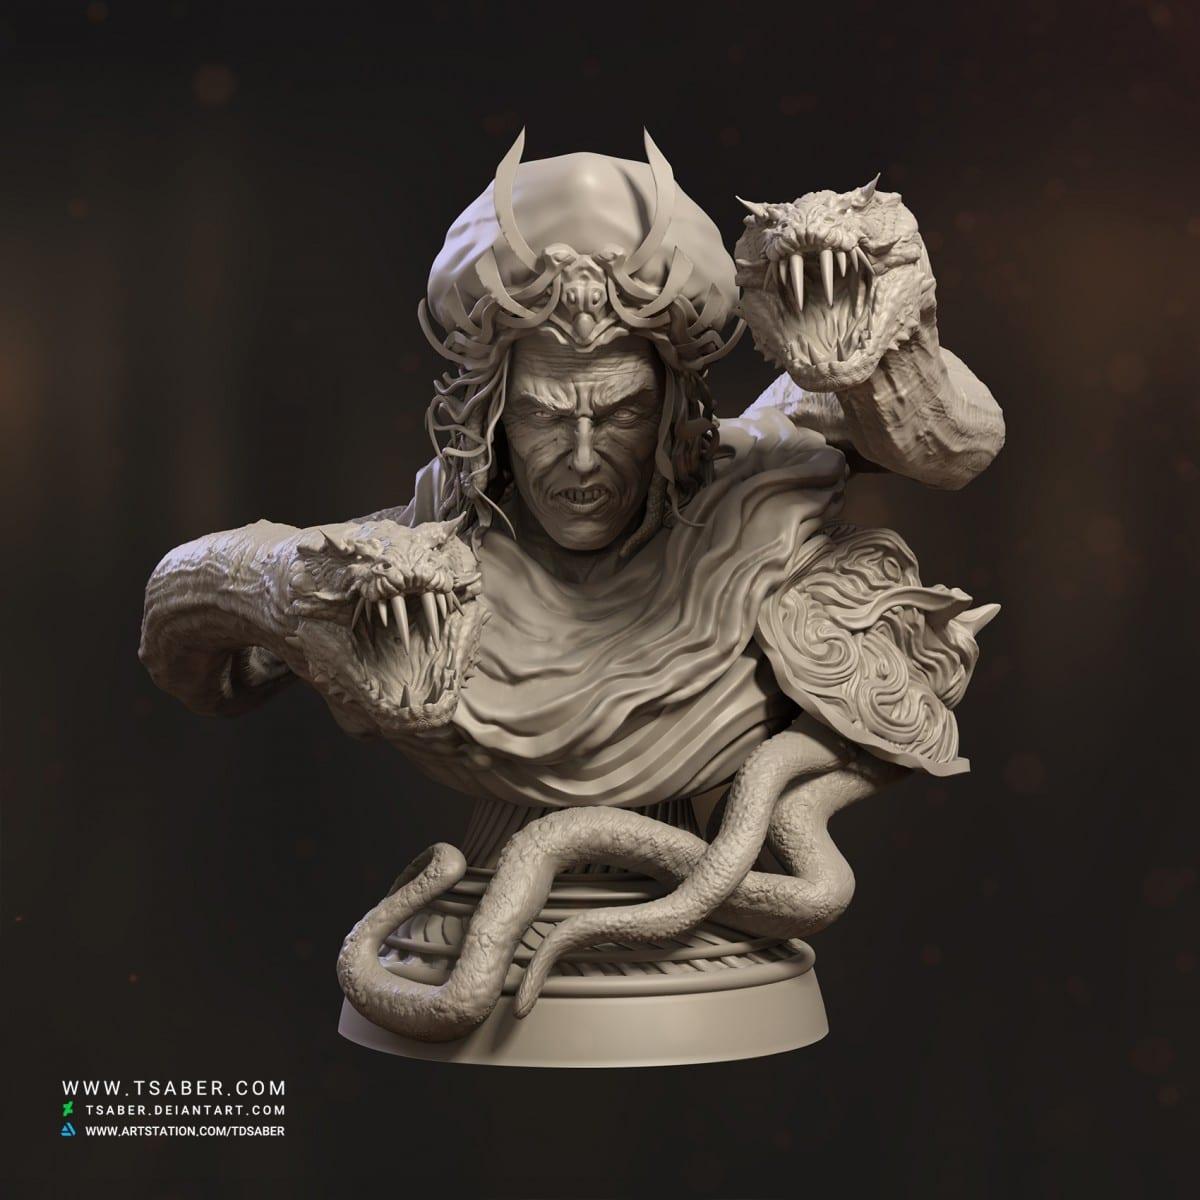 Zahhak Bust - Zbrush sculpting - Tsaber